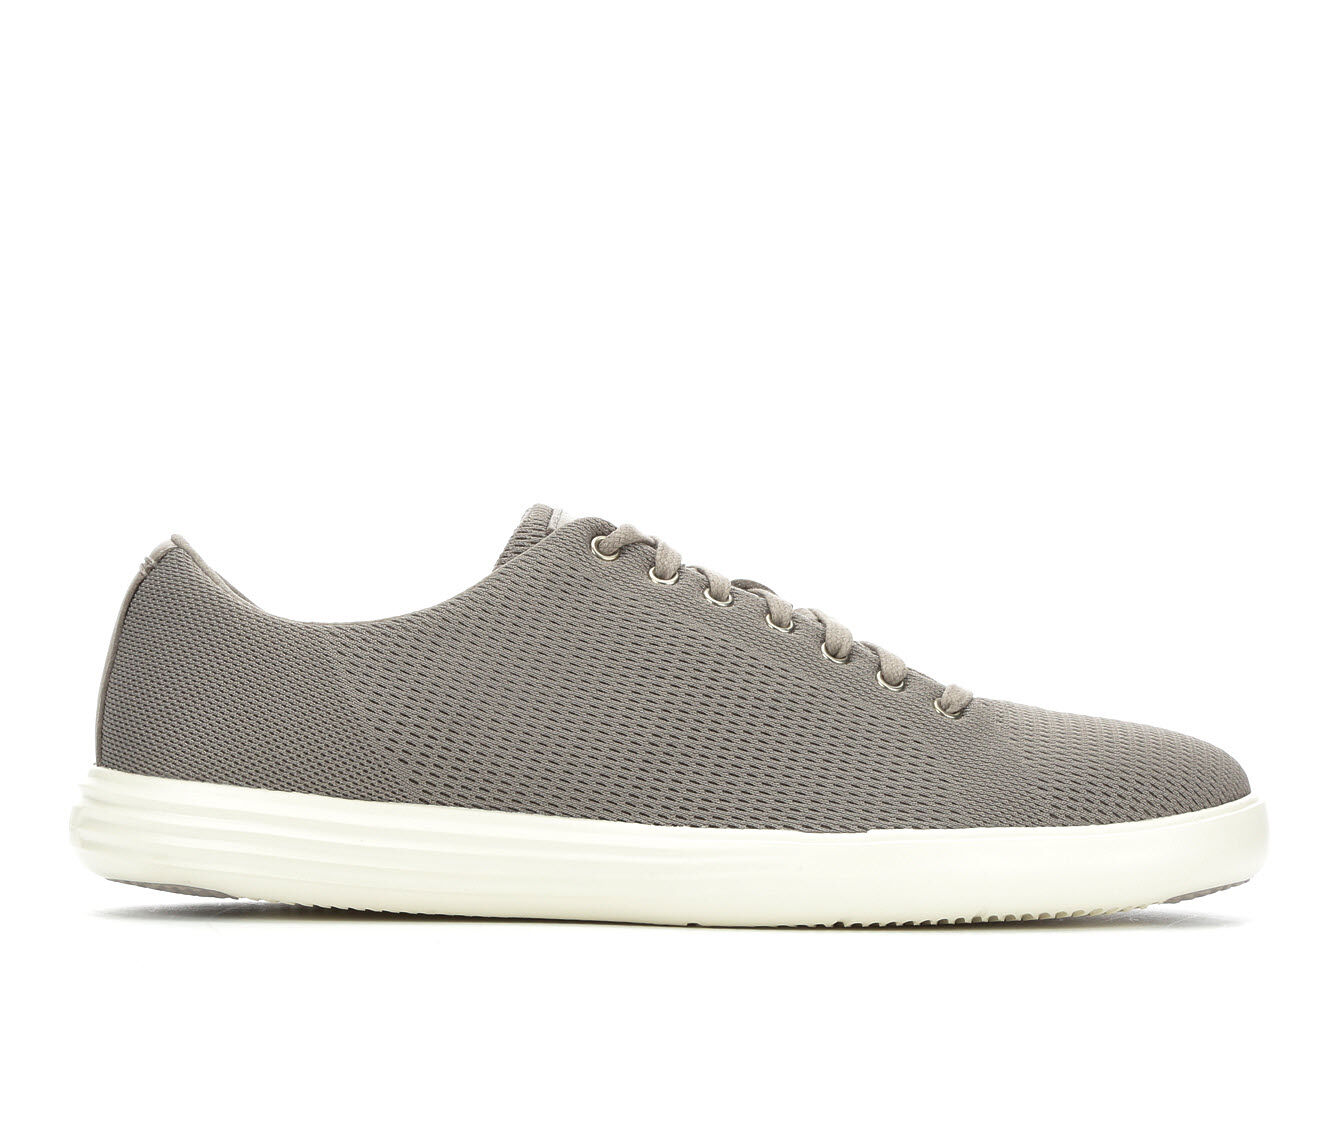 Men's Cole Haan Grand Crosscourt Knit Dress Shoes Rockridge Grey